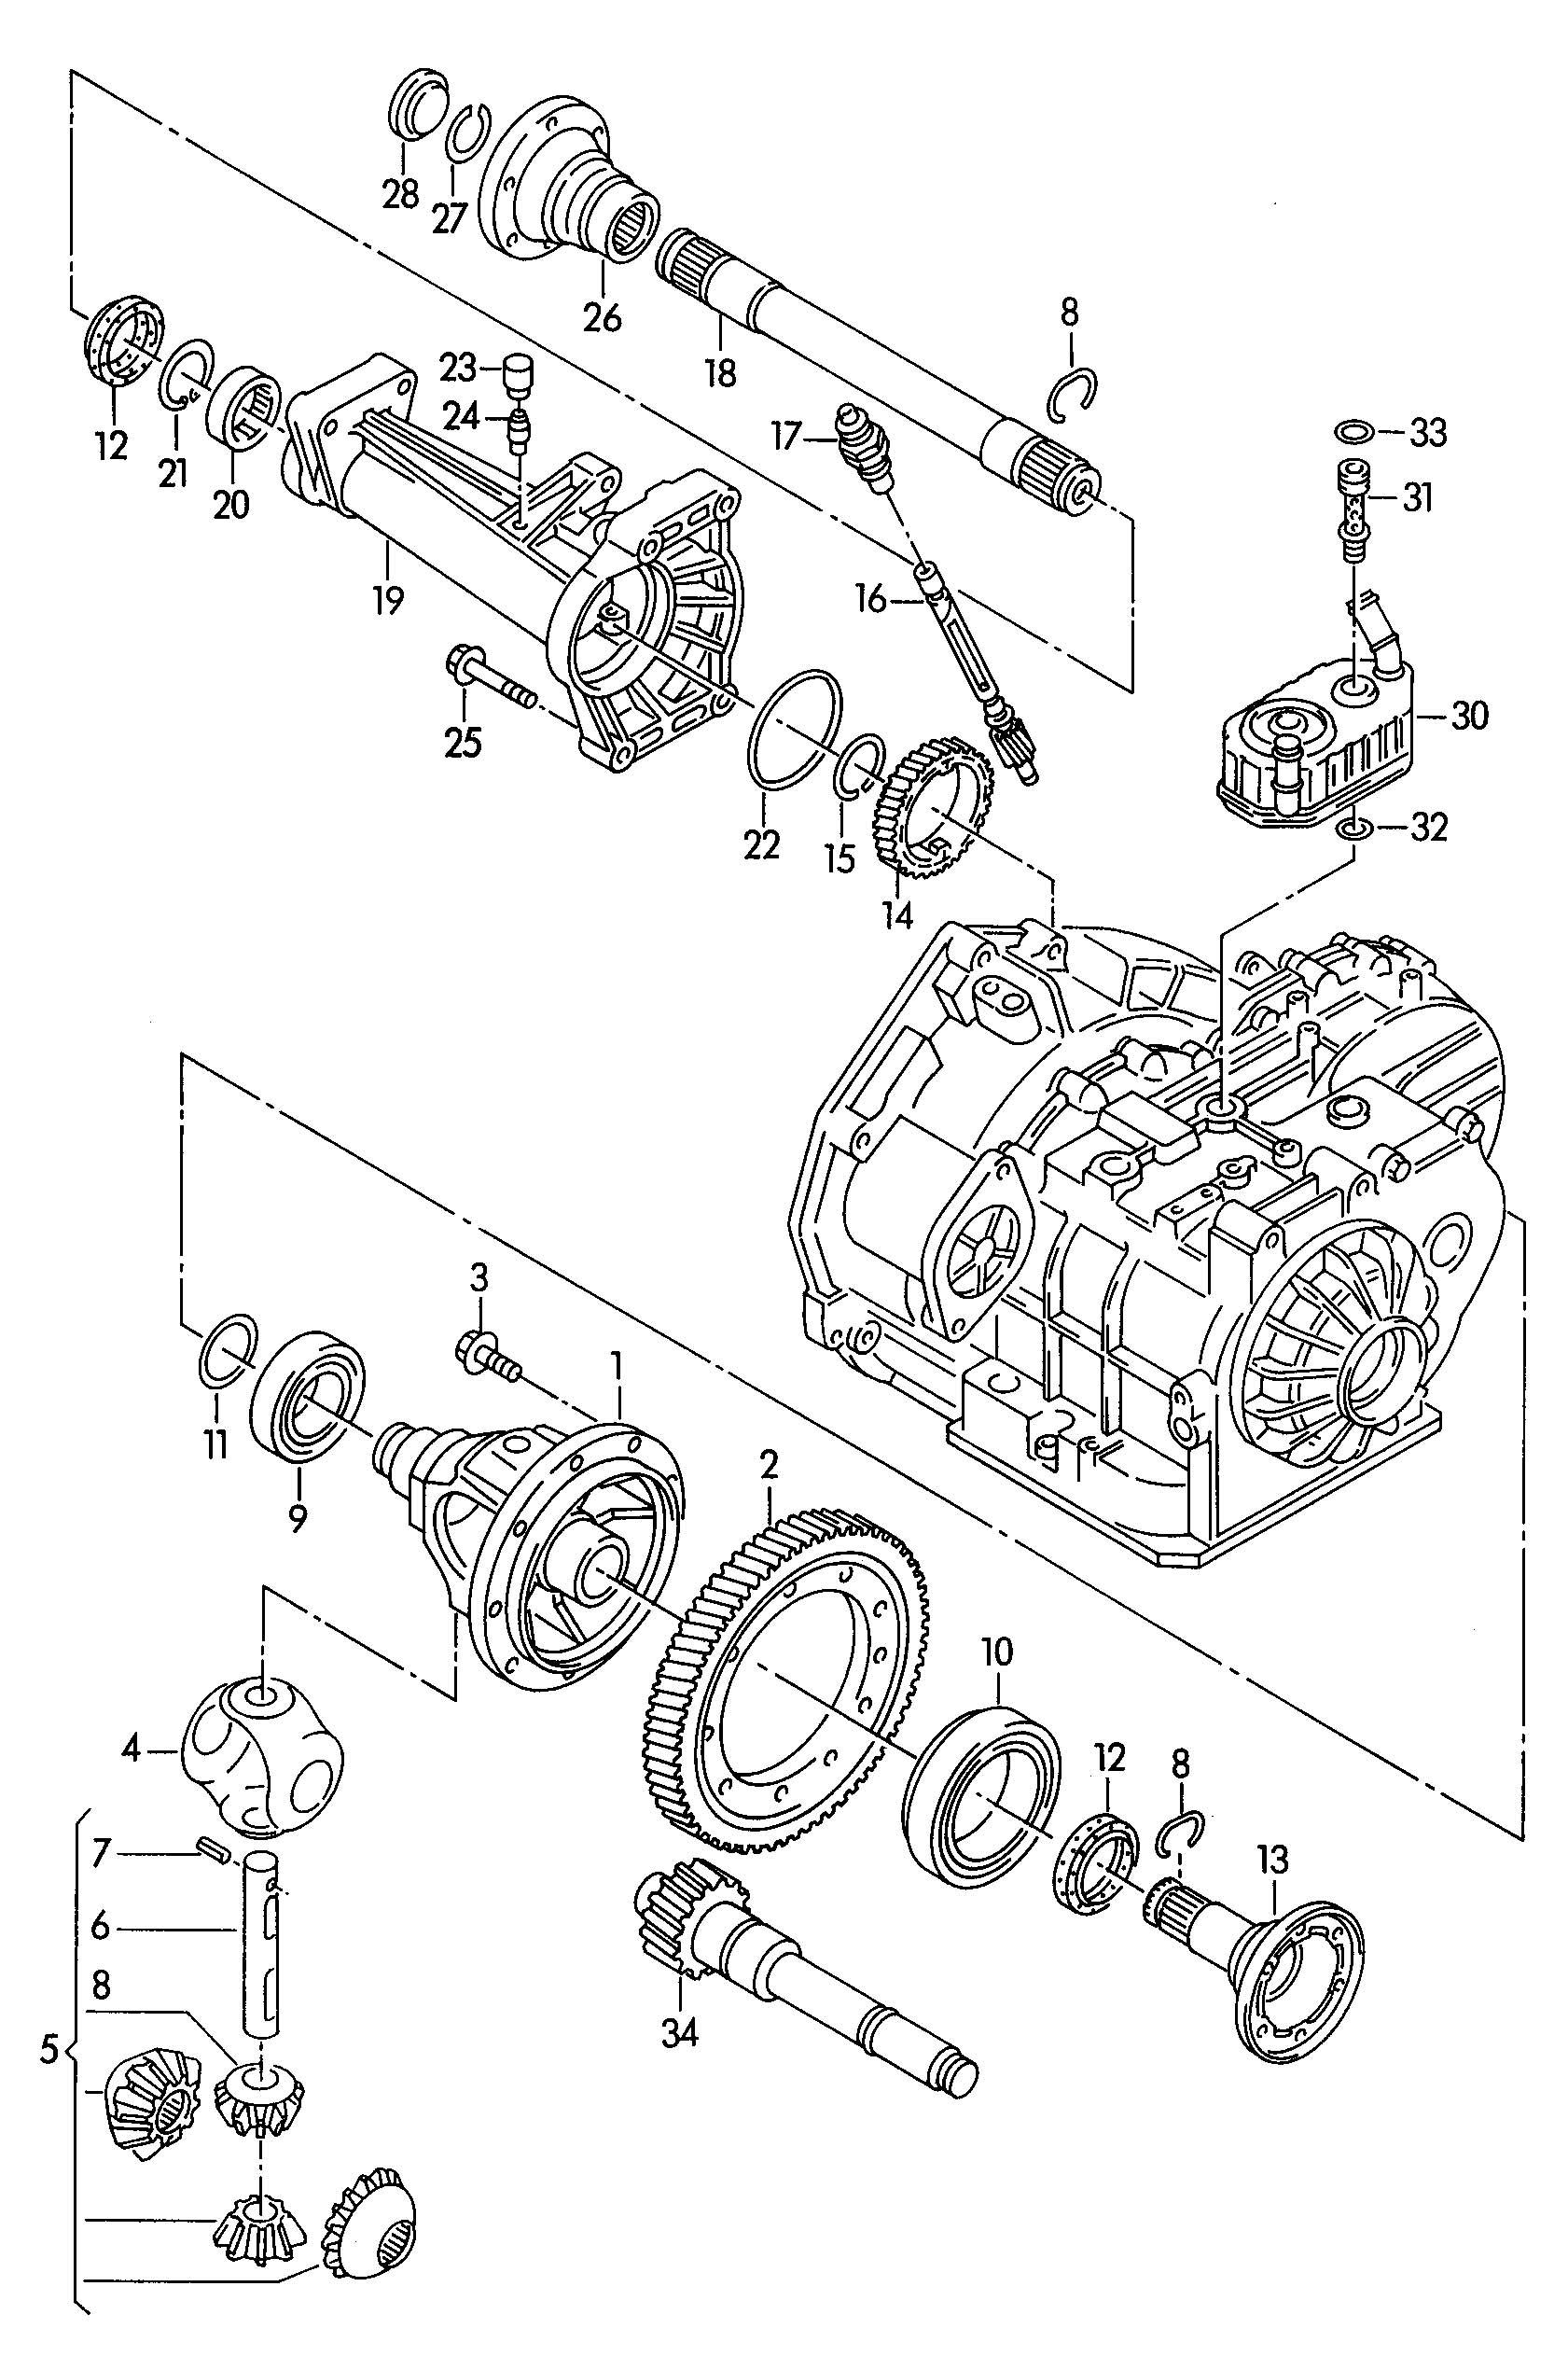 Volkswagen EuroVan Circlip. PROPELLER, EQH, EHVDVZEZG